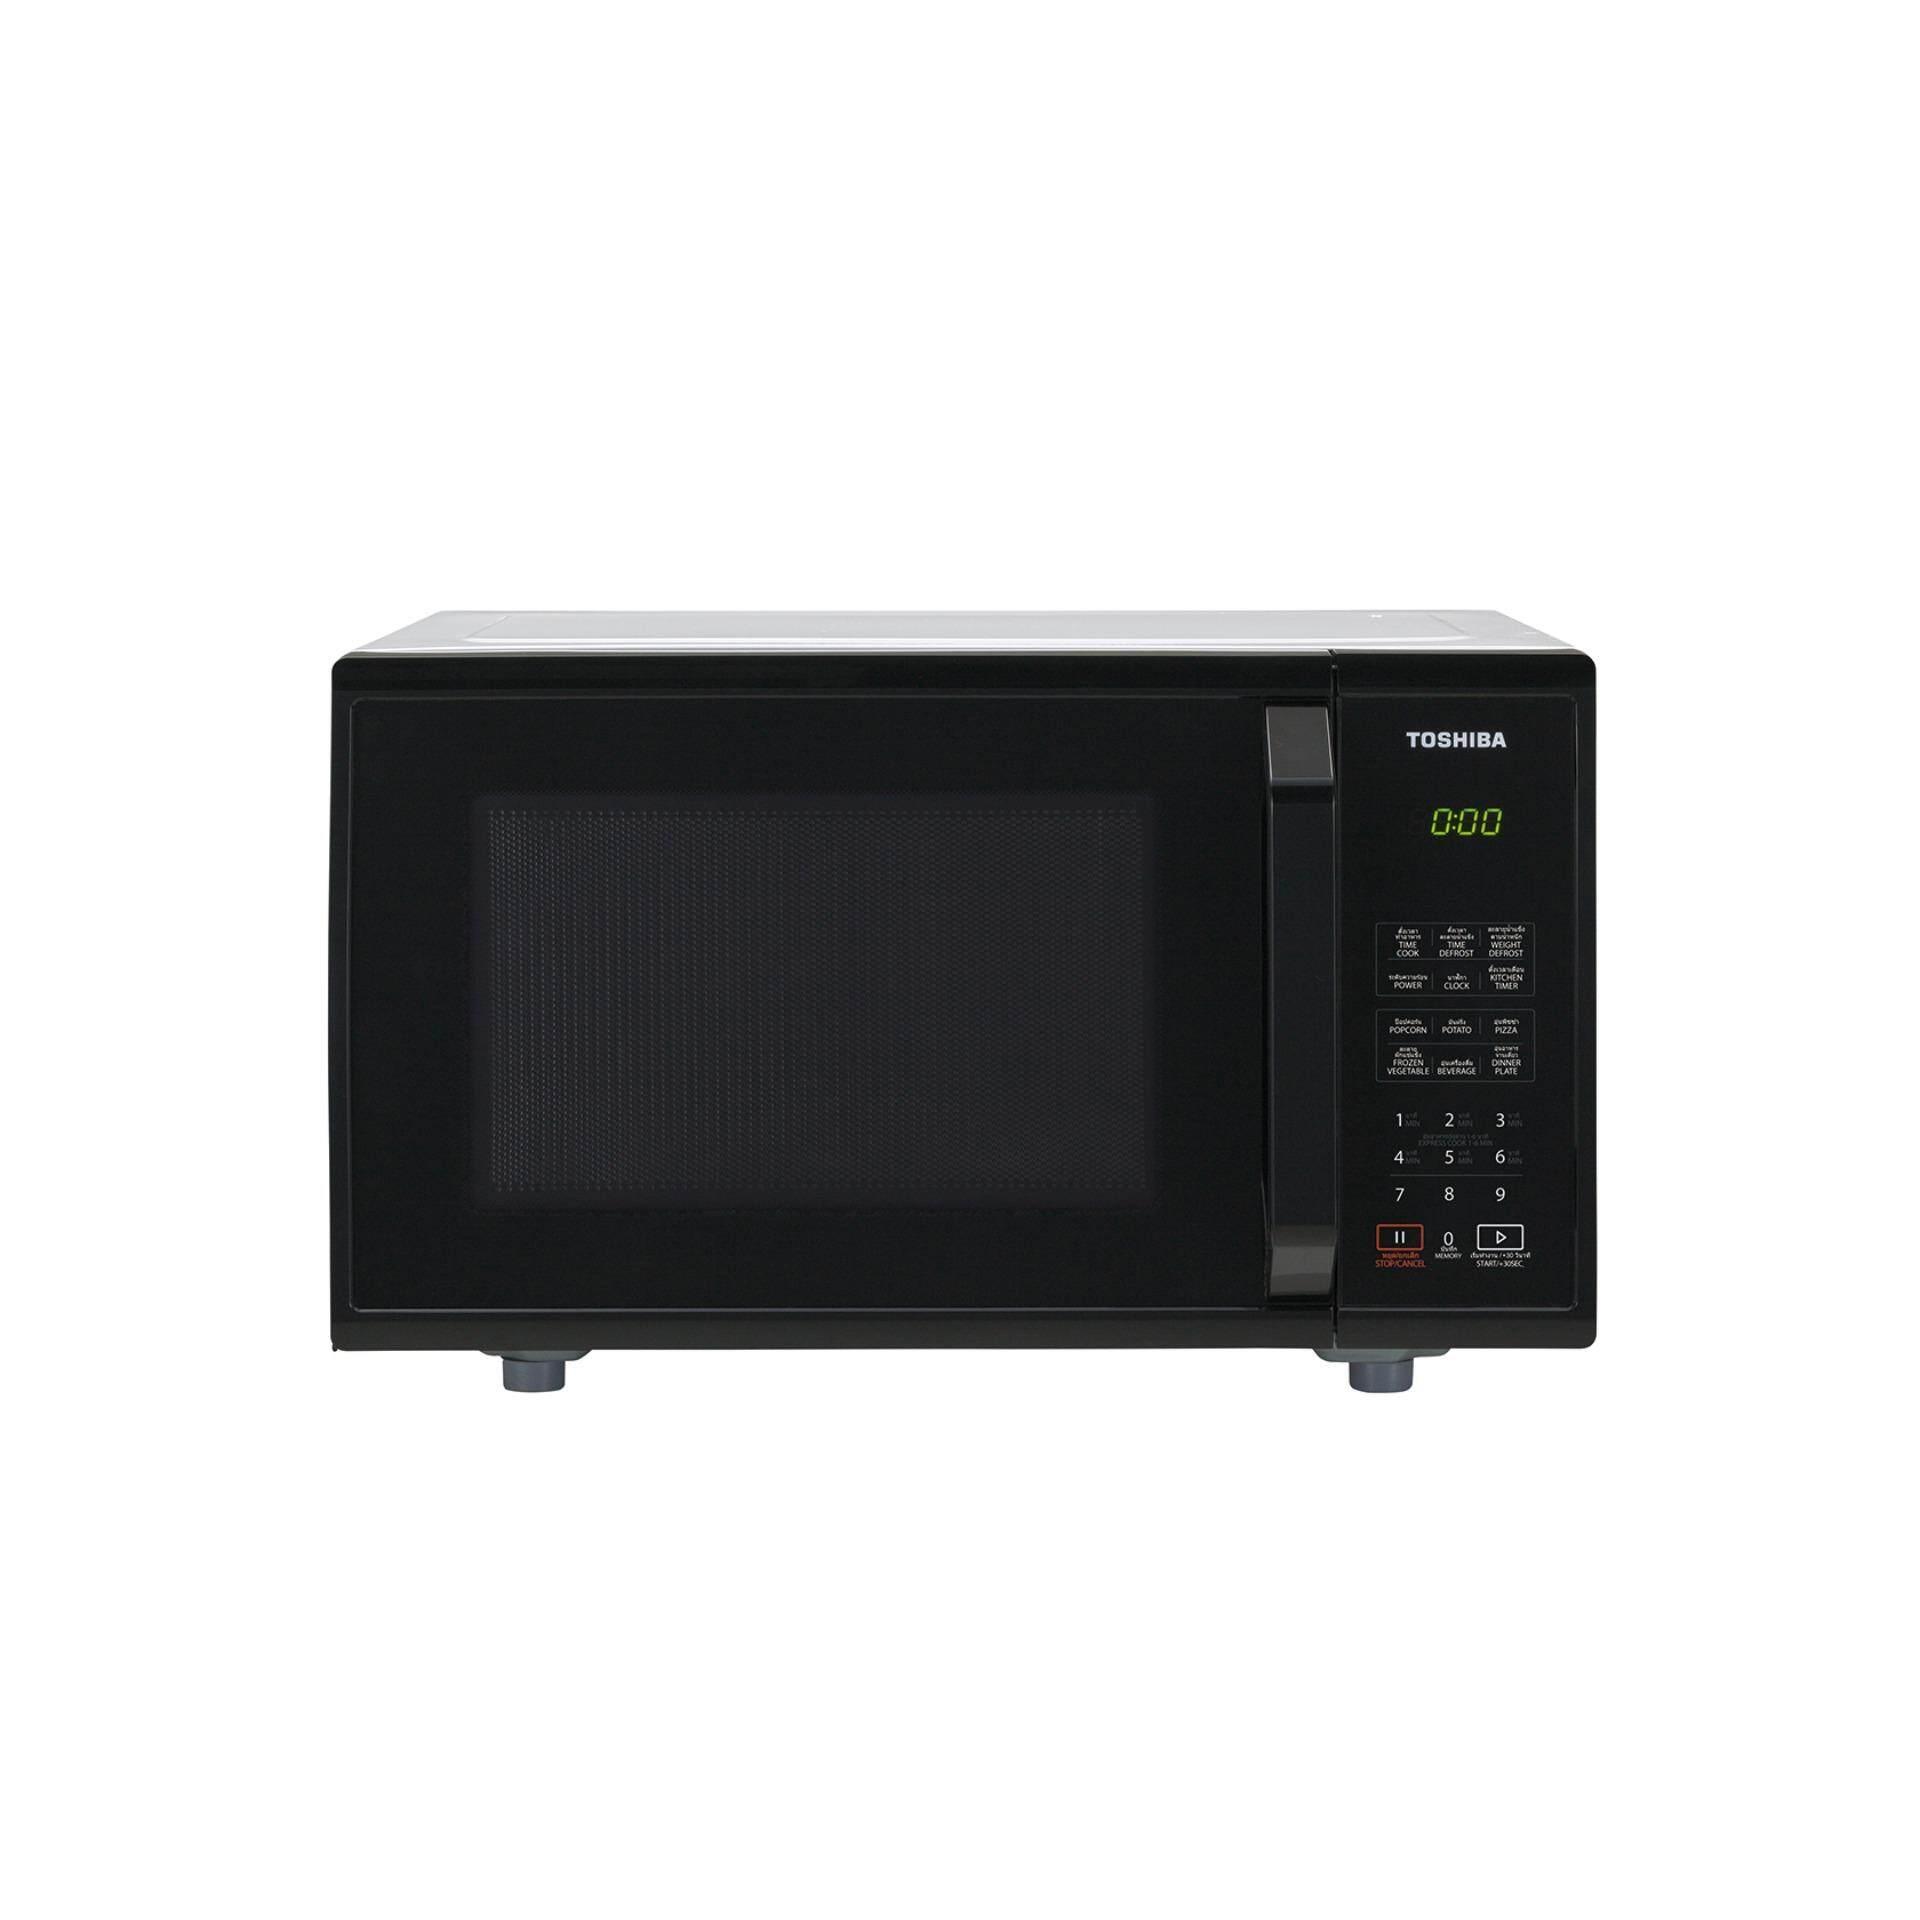 Toshiba ไมโครเวฟ ความจุ 23 ลิตร รุ่น ER-SS23(K)TH